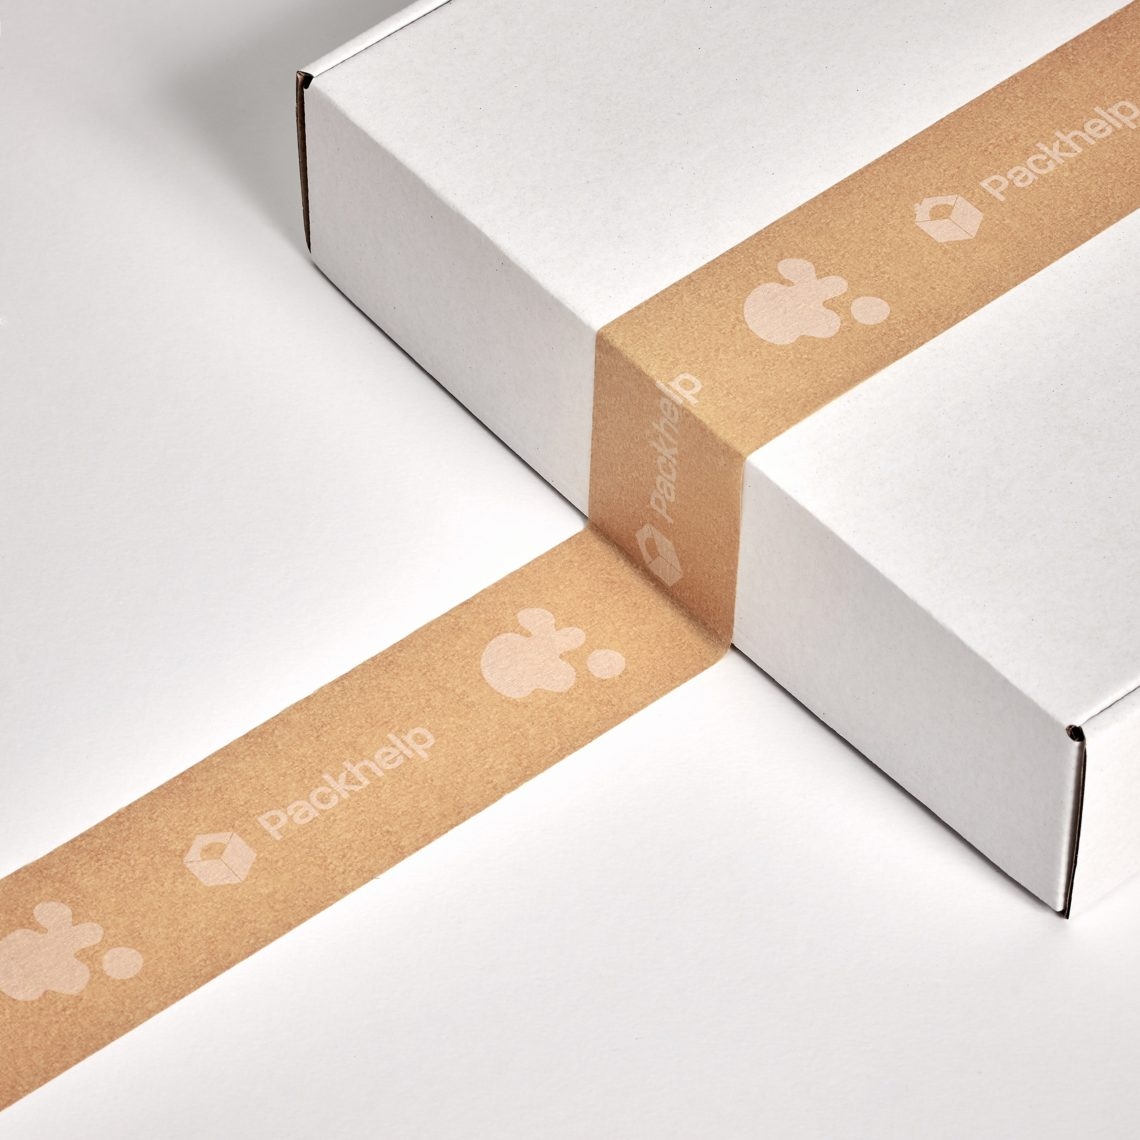 Requisiti per un packaging vincente